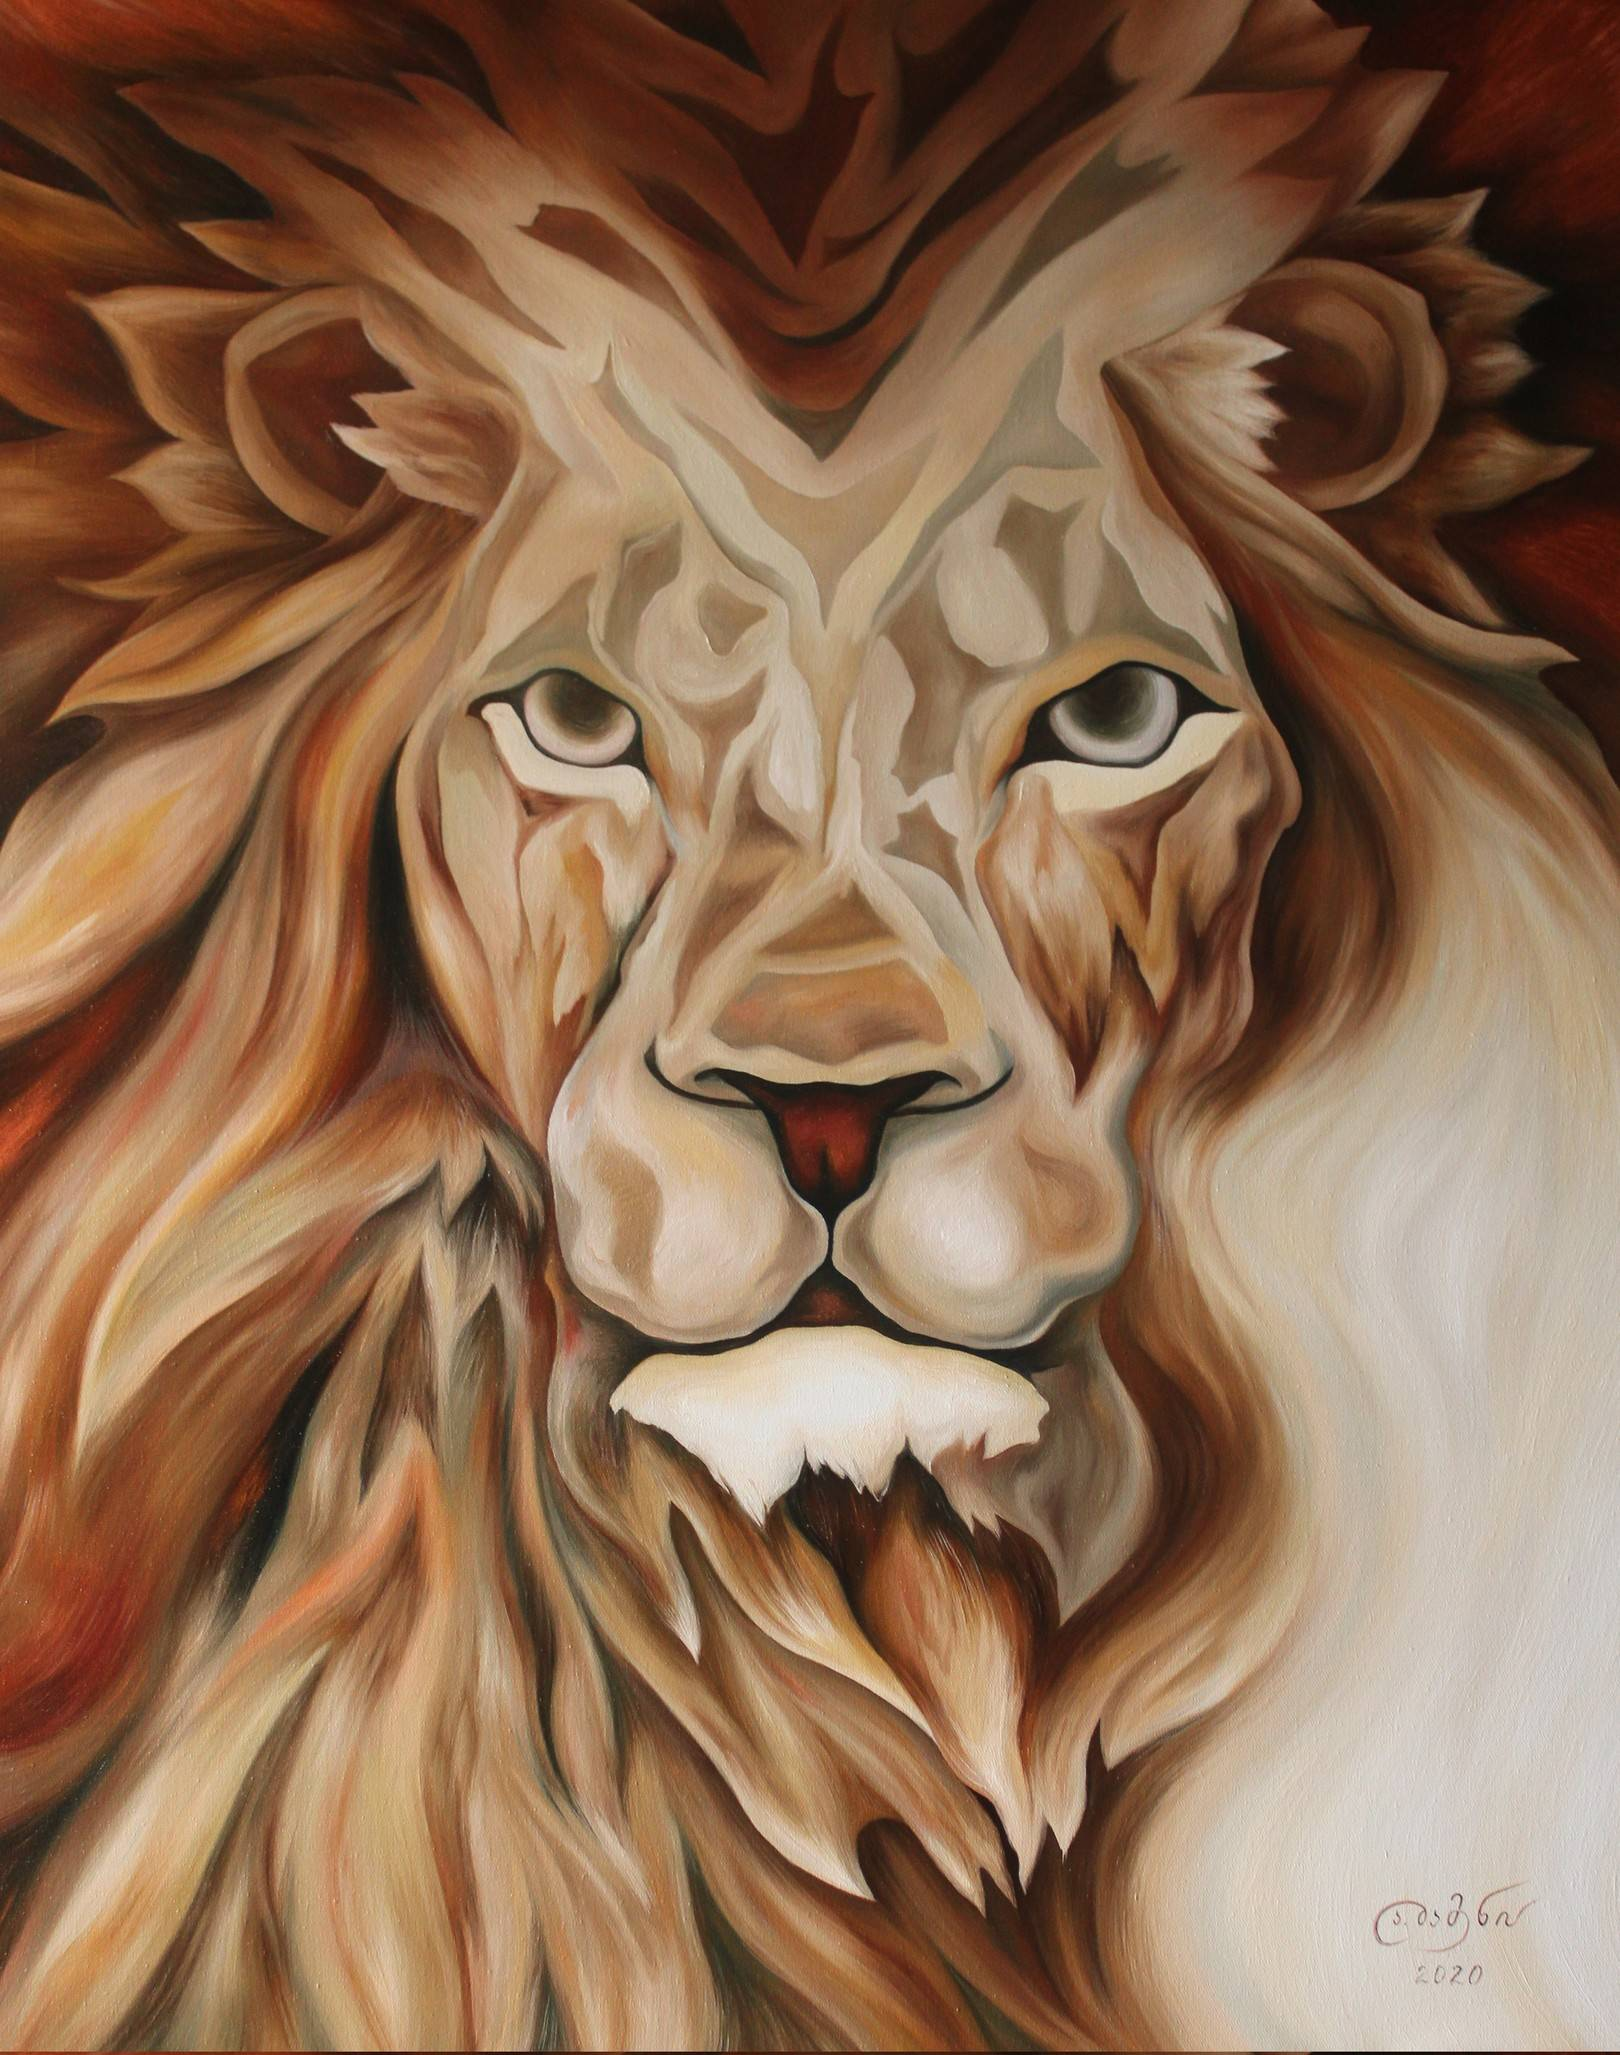 «Лев — Астрологический автопортрет»                                холст, масло «Lion - Astrological Self Portrait»                                              oil on canvas    100x80, 2020